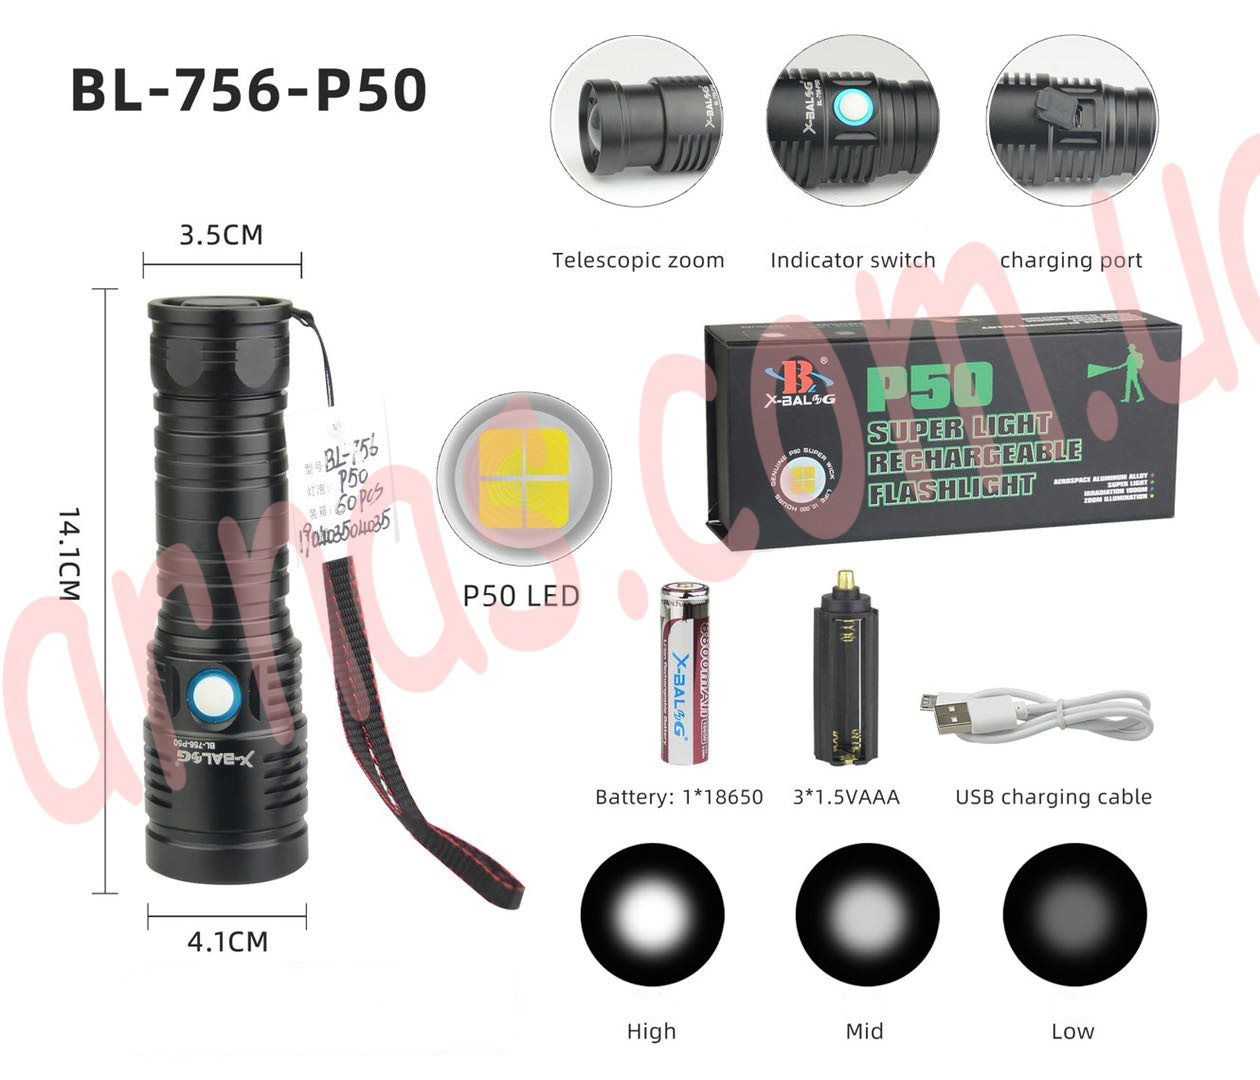 Акумуляторний ліхтар BL-756-P50